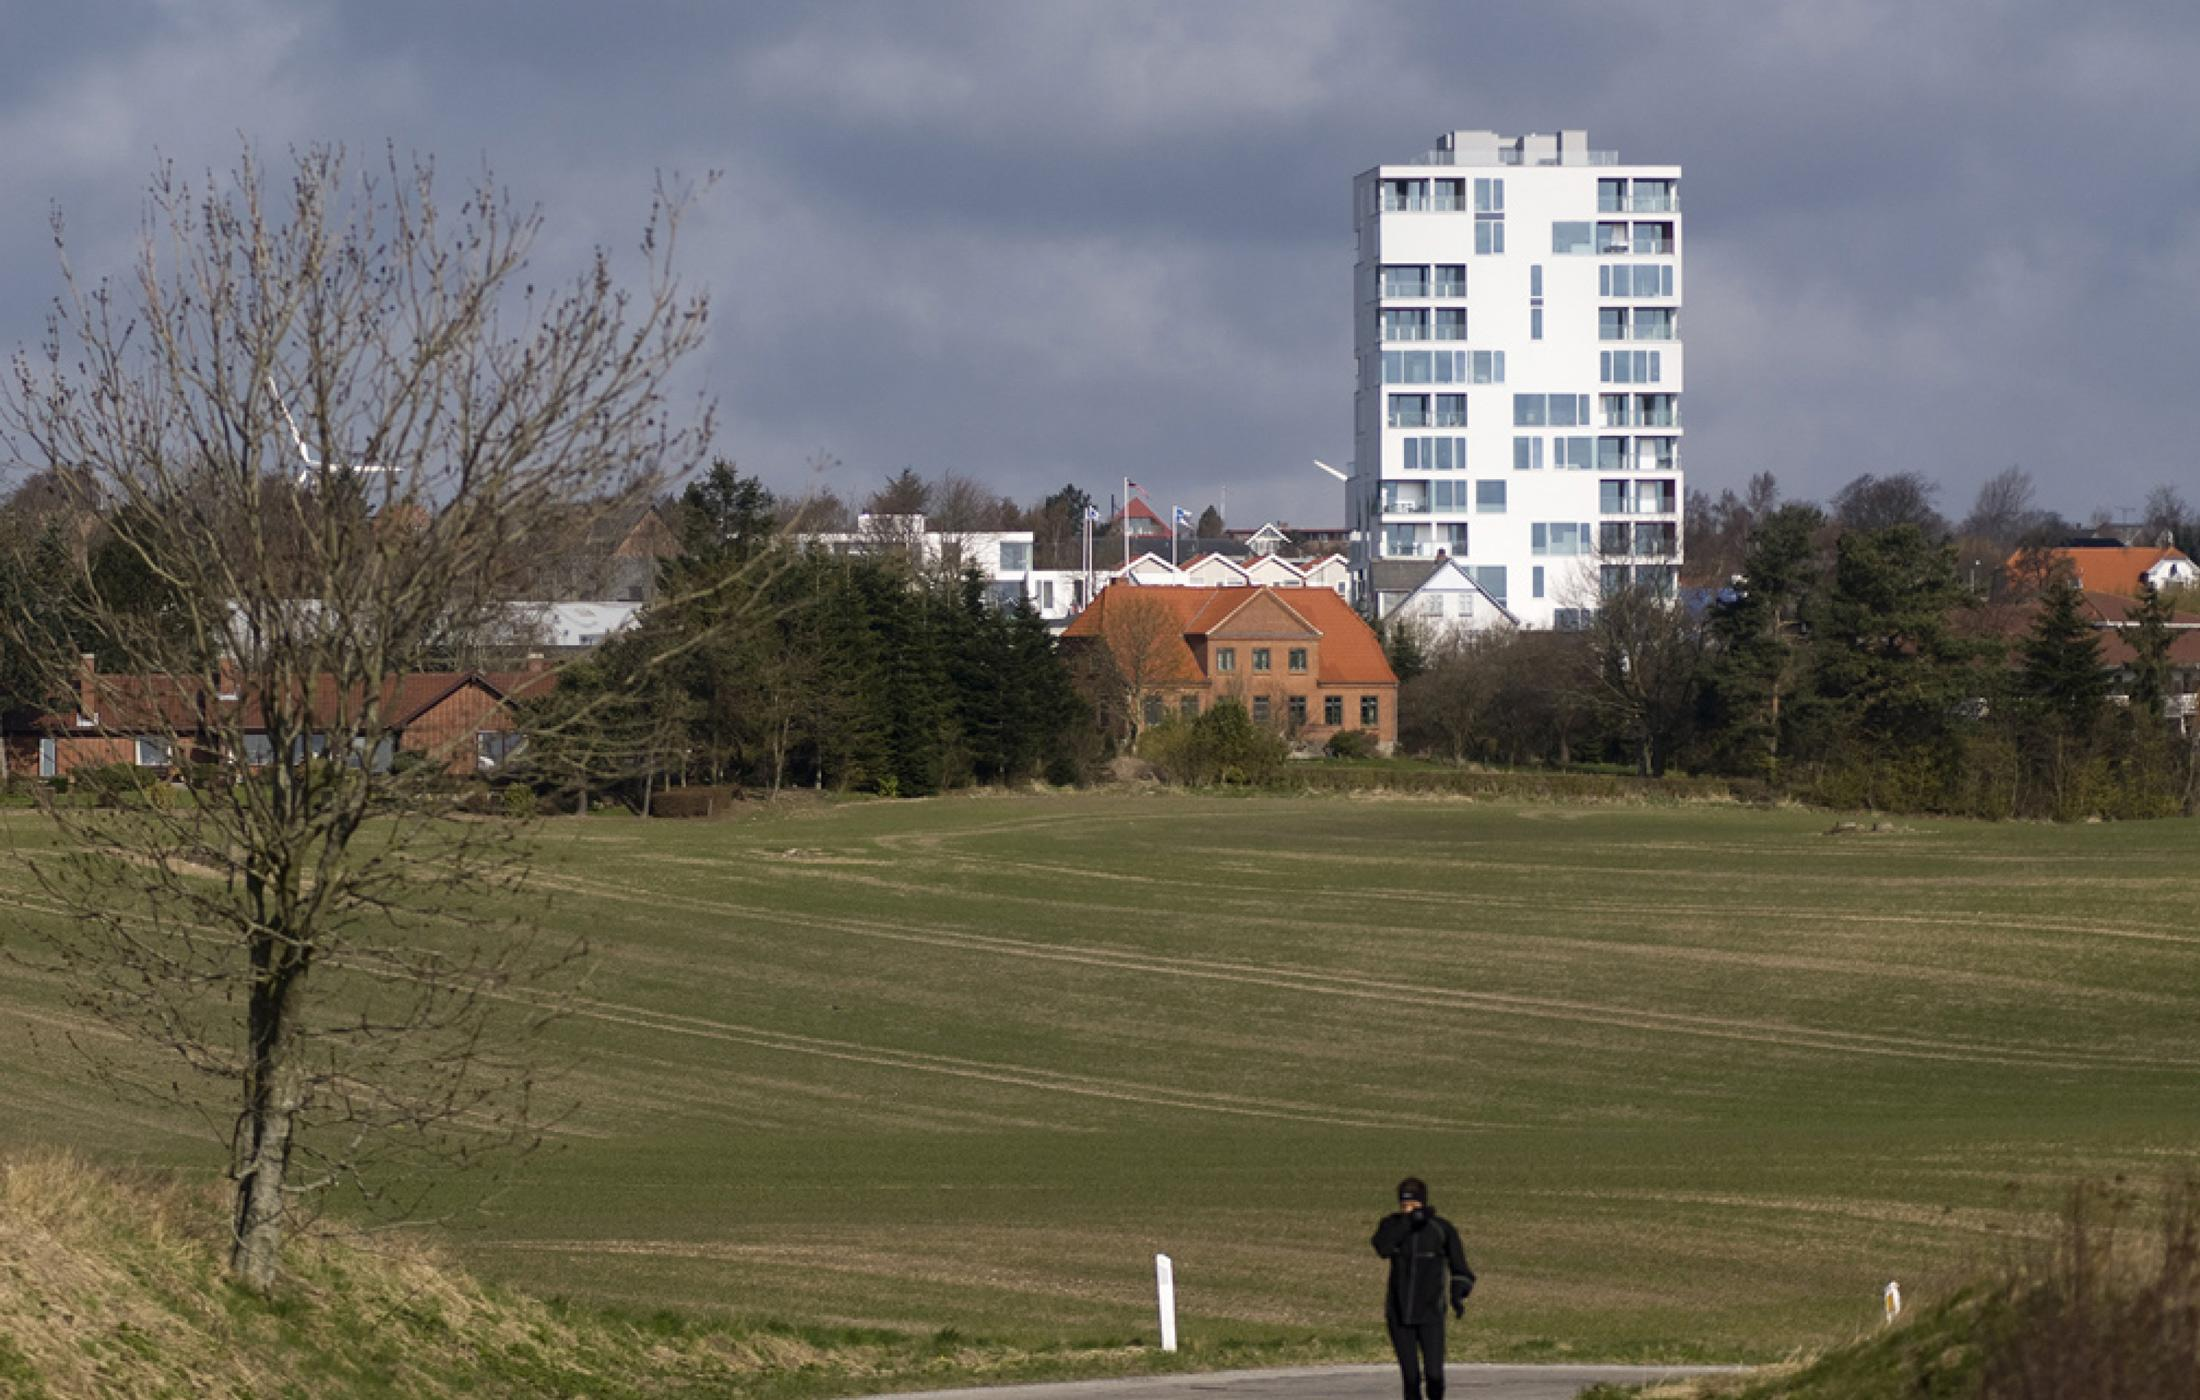 Urban High Rise in Aarhus (Denemarken)